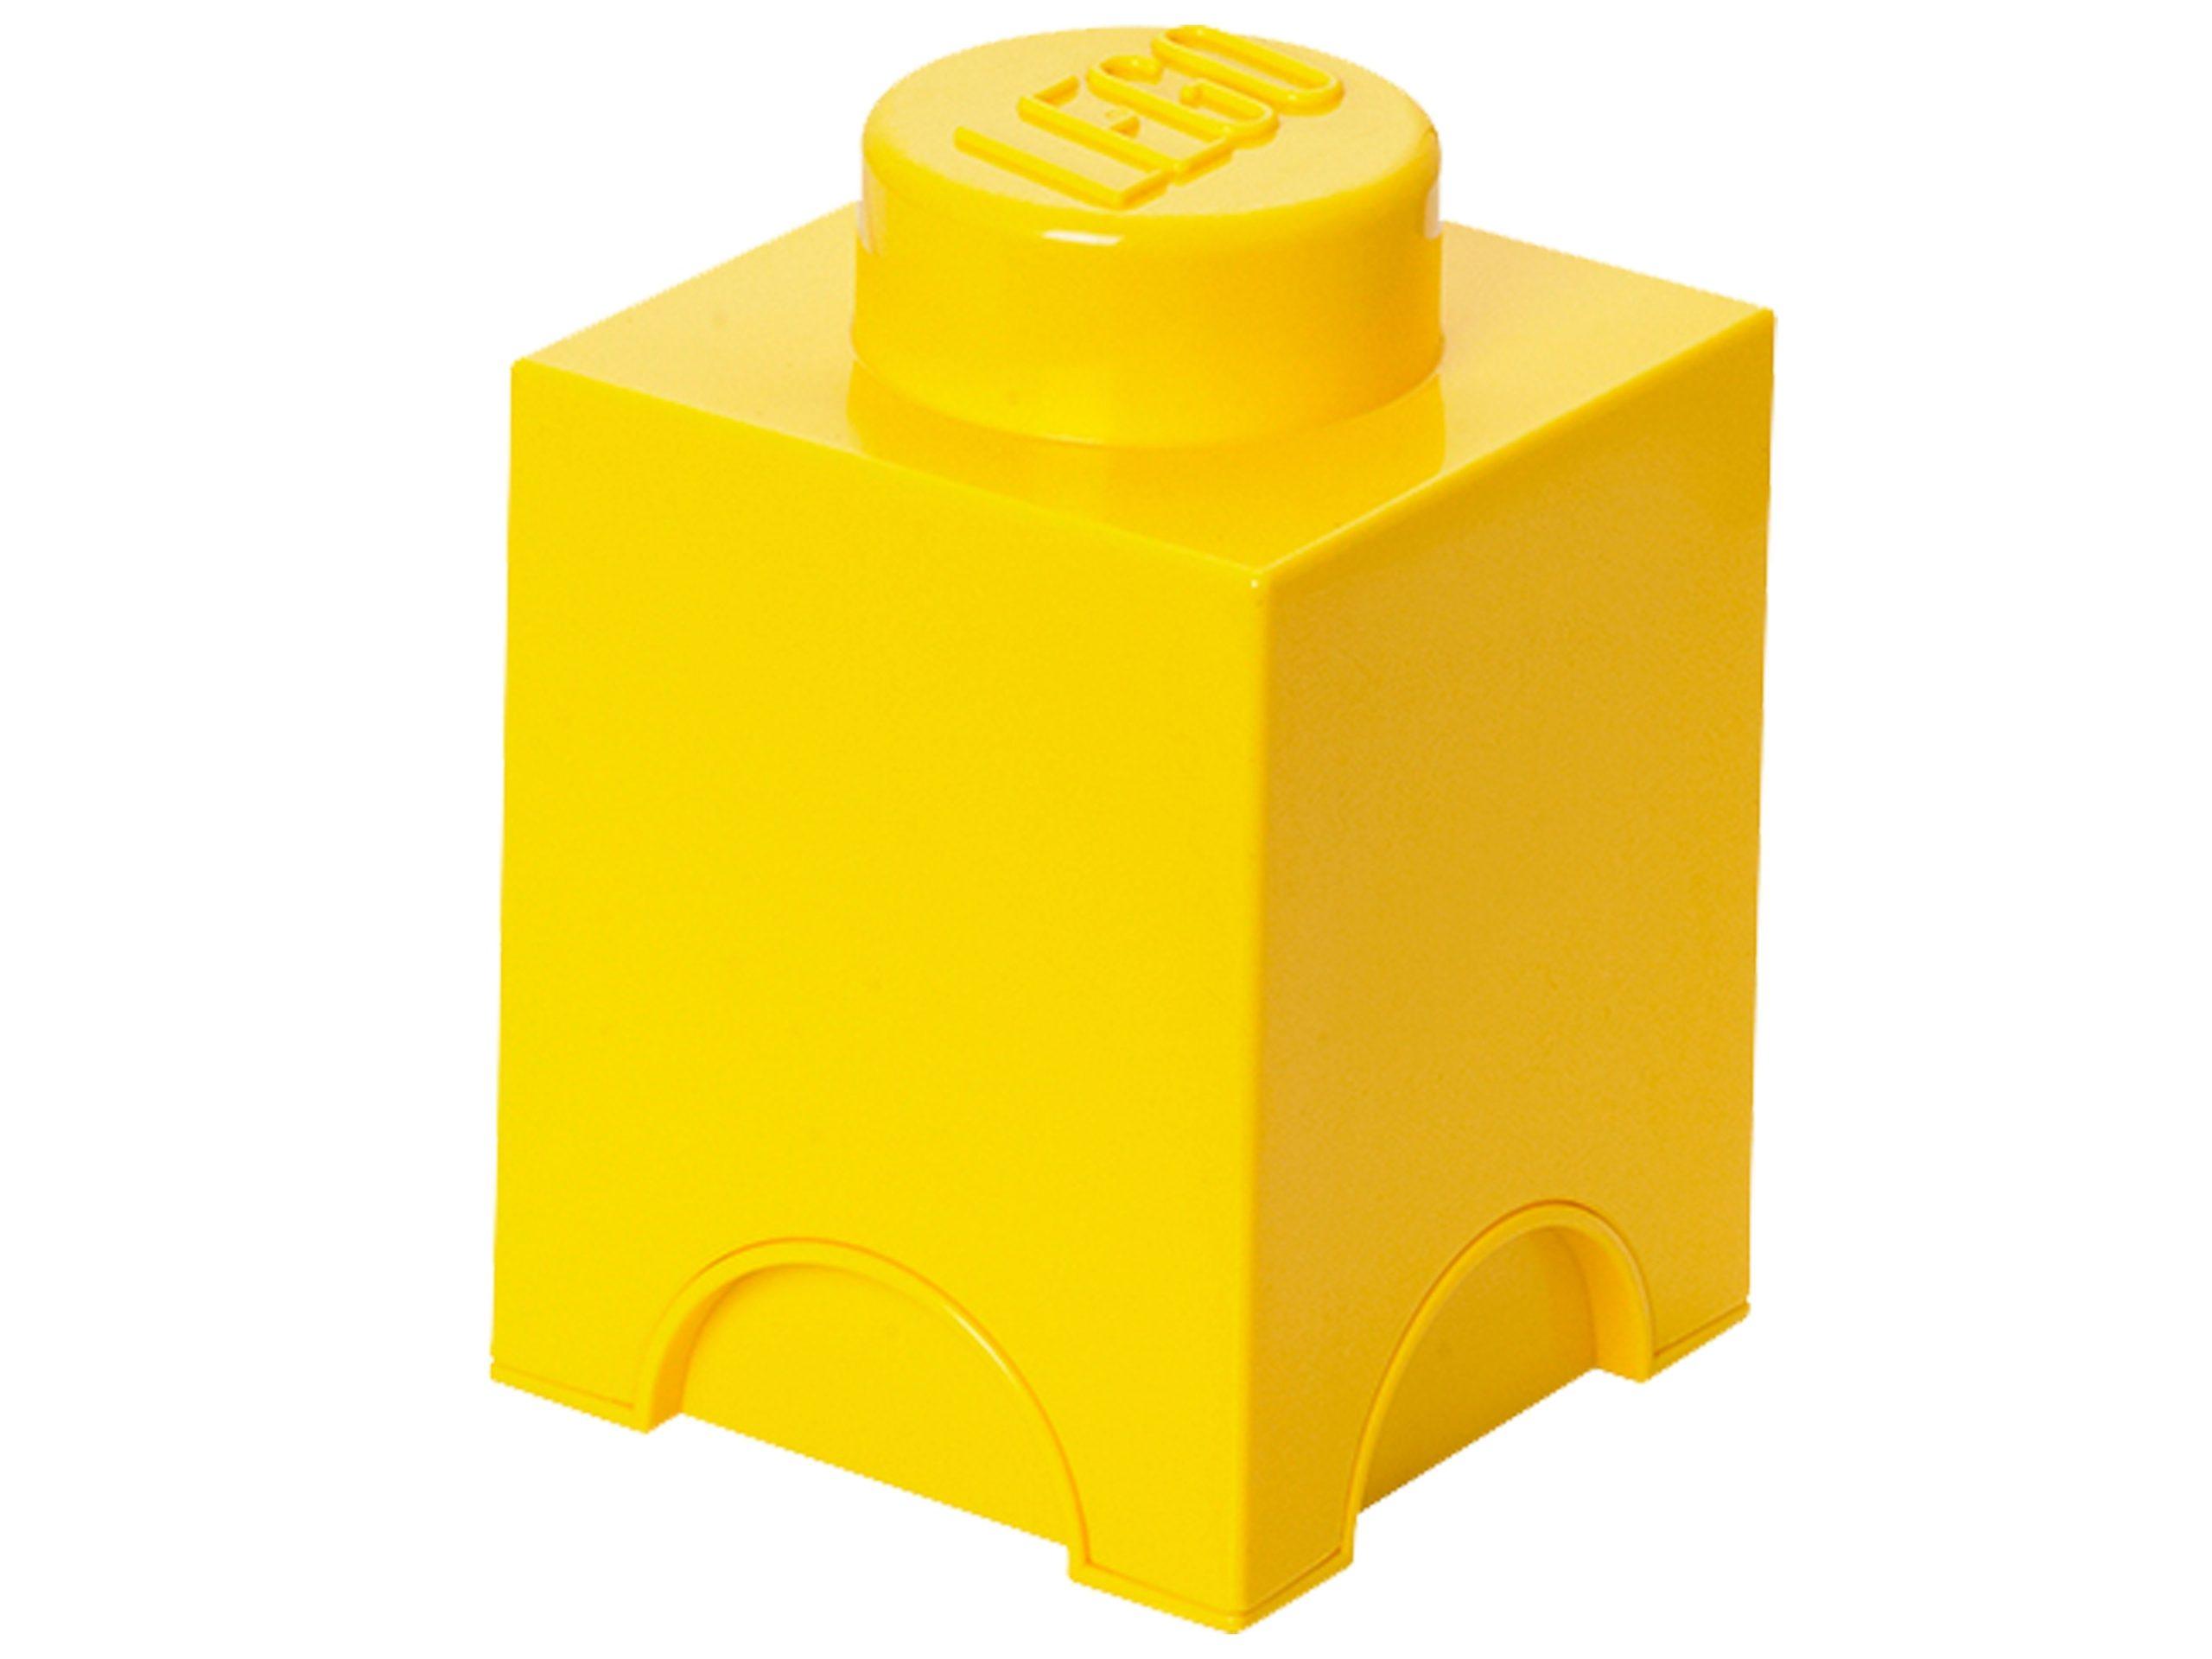 lego 5004898 1 stud yellow storage brick scaled